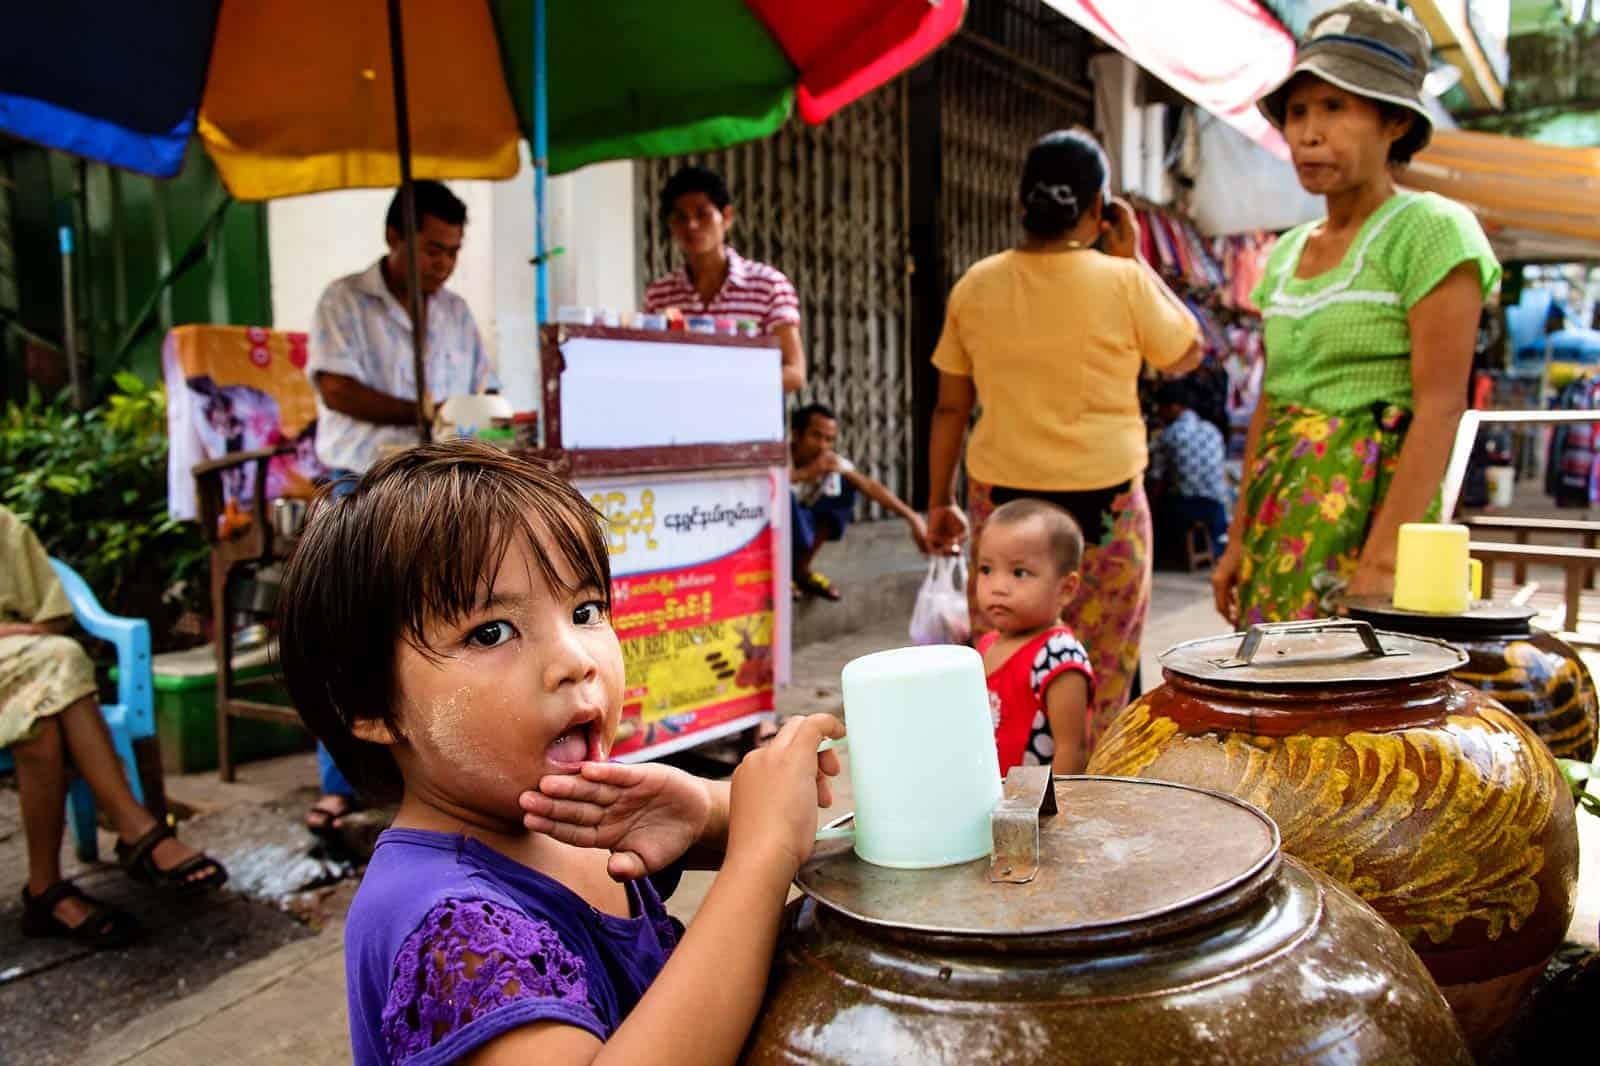 Cena de rua em Yangon